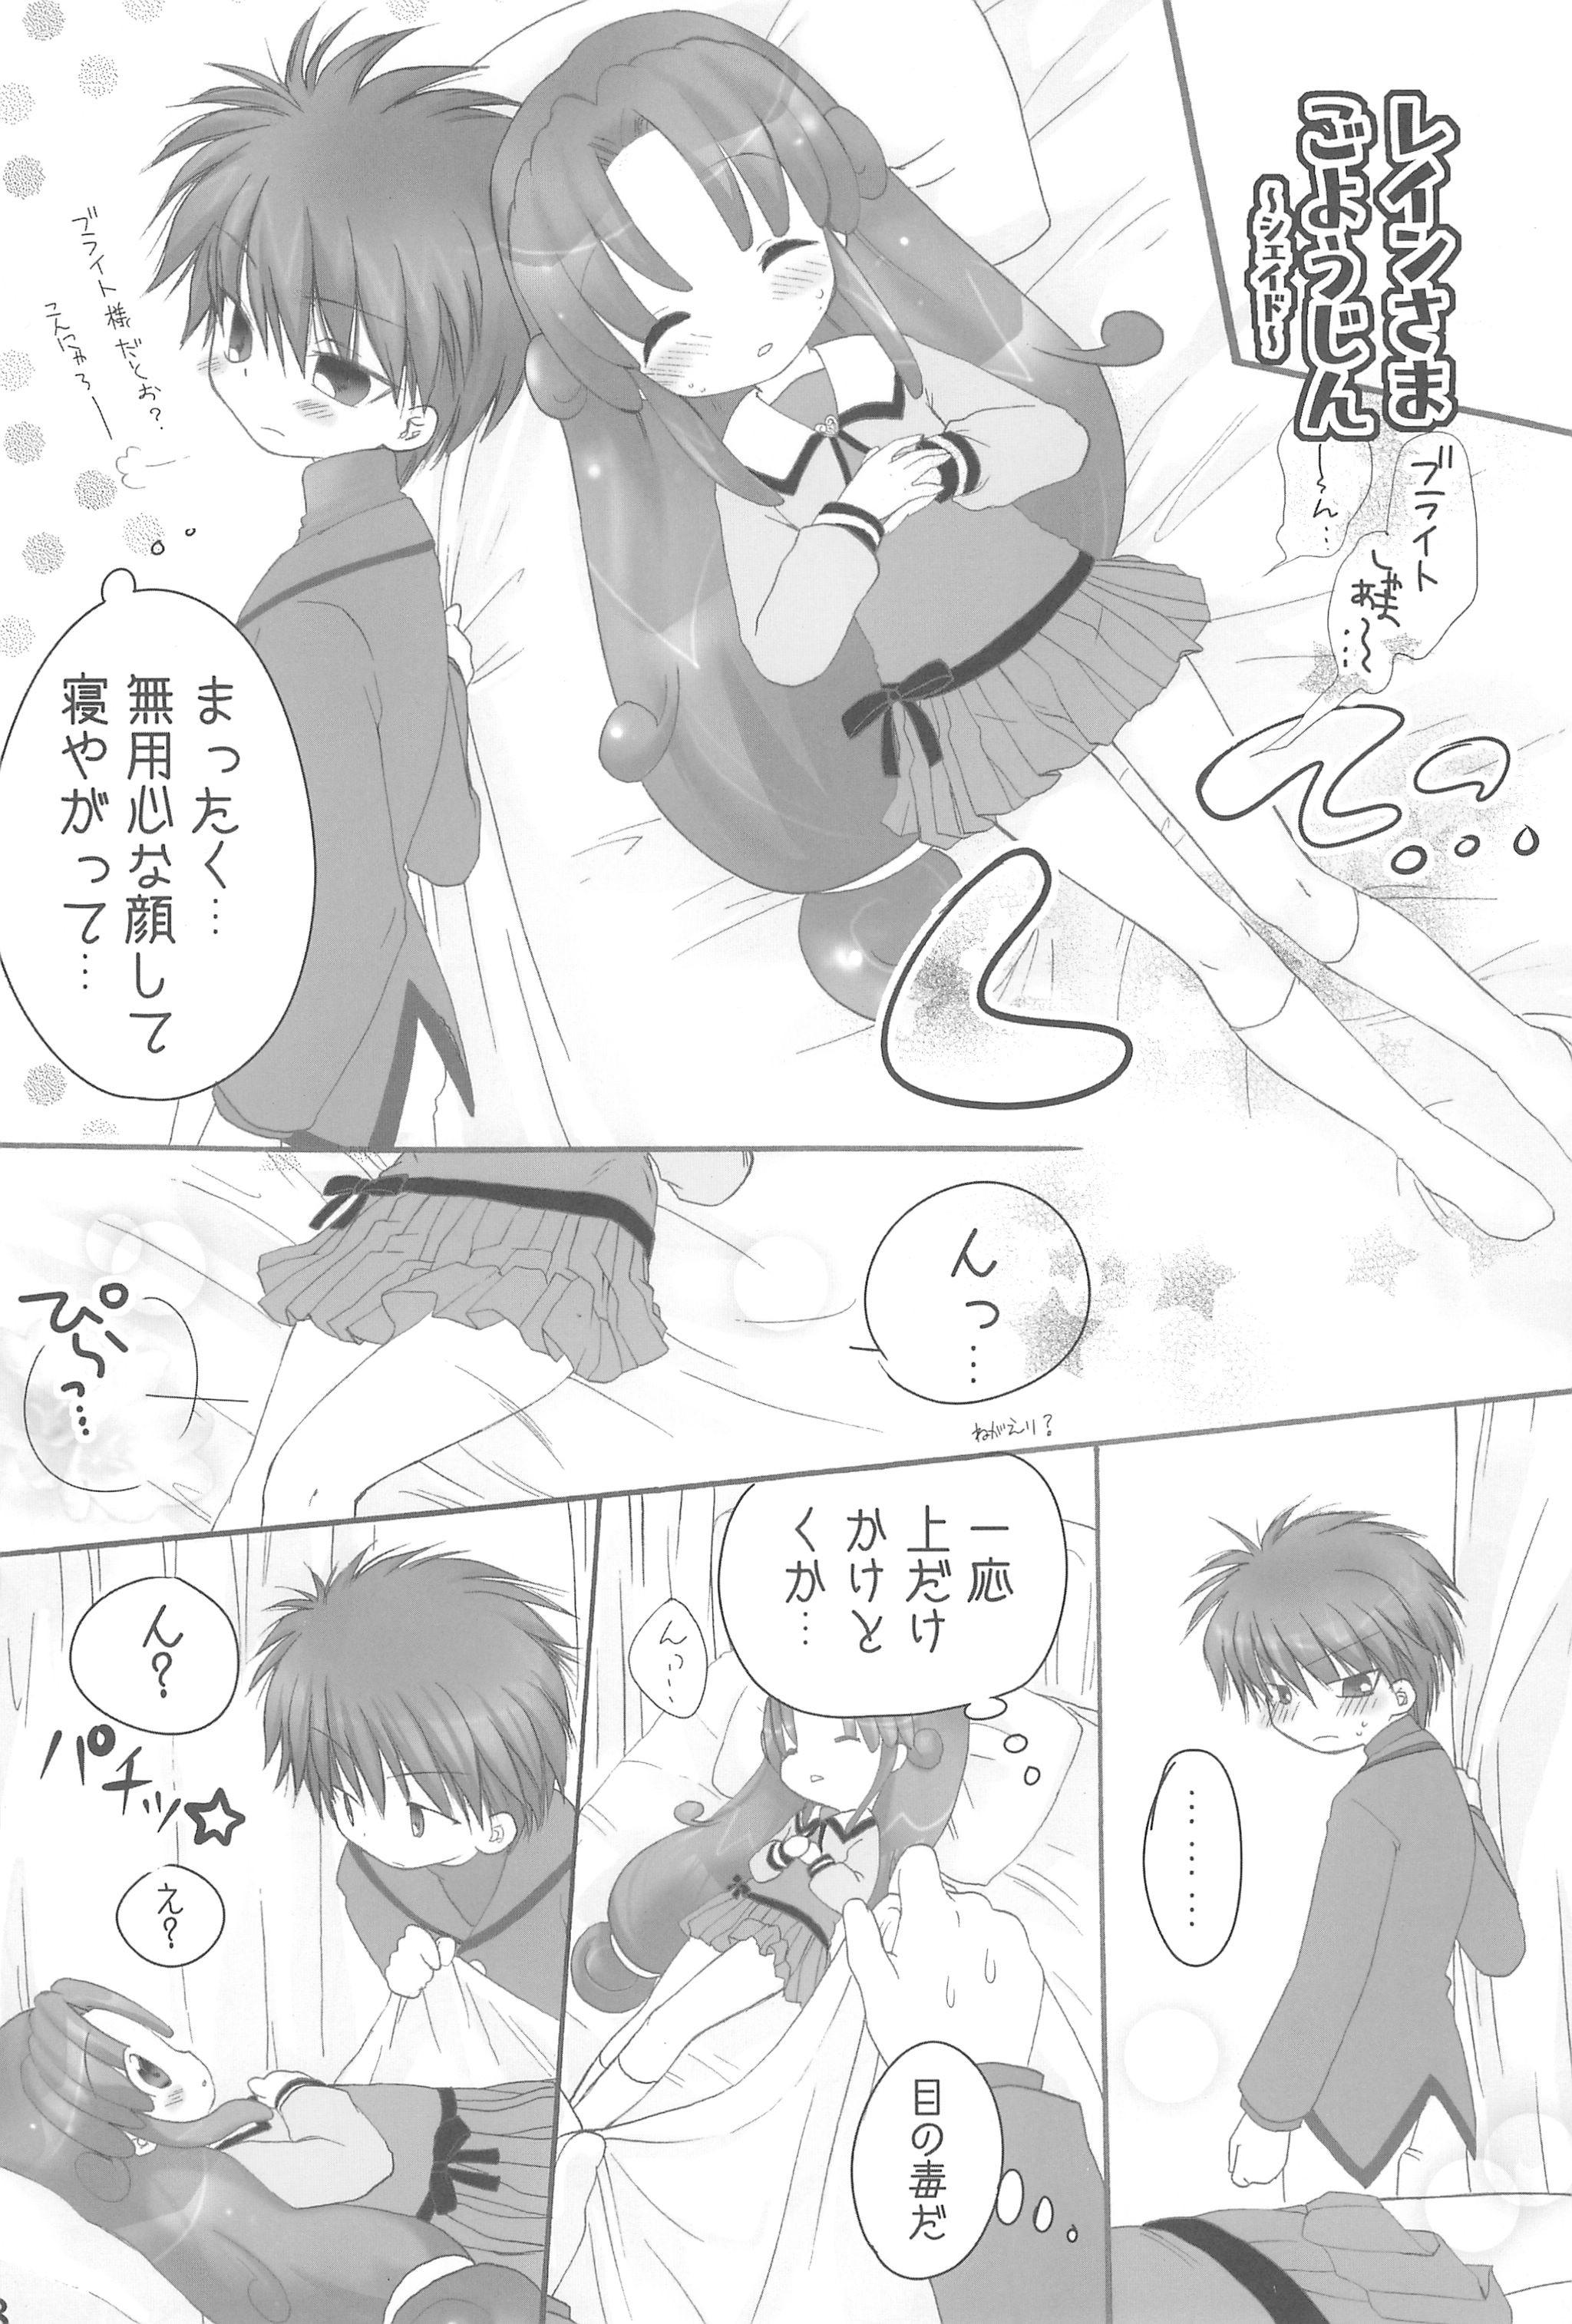 Rein-sama, Goyoujin! 7